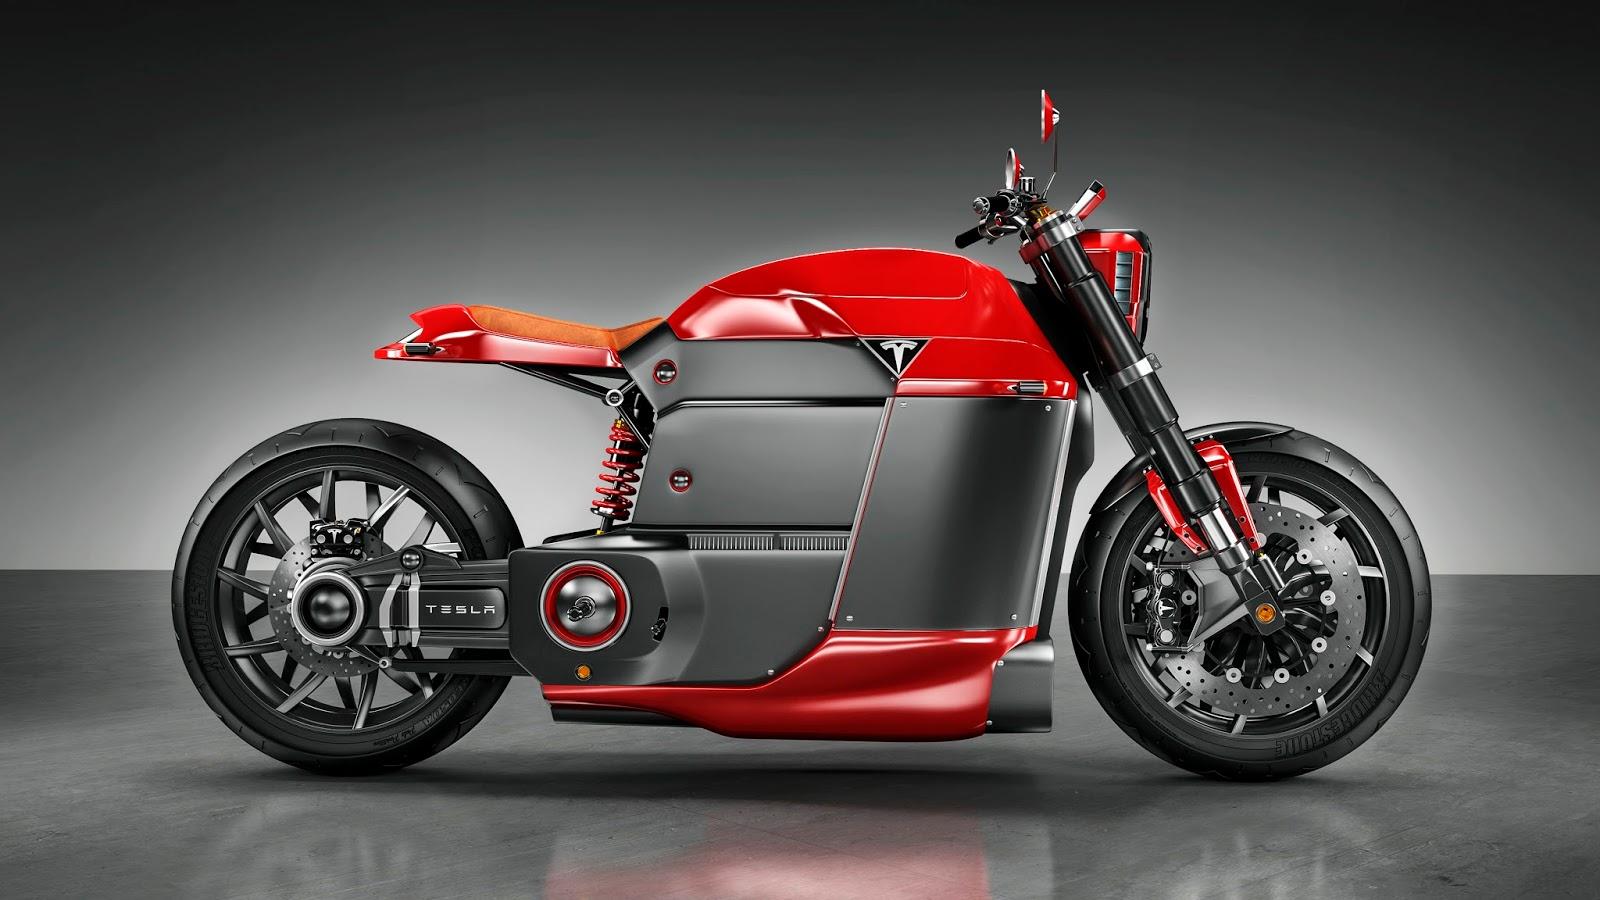 tesla-motorcycle-01.jpg